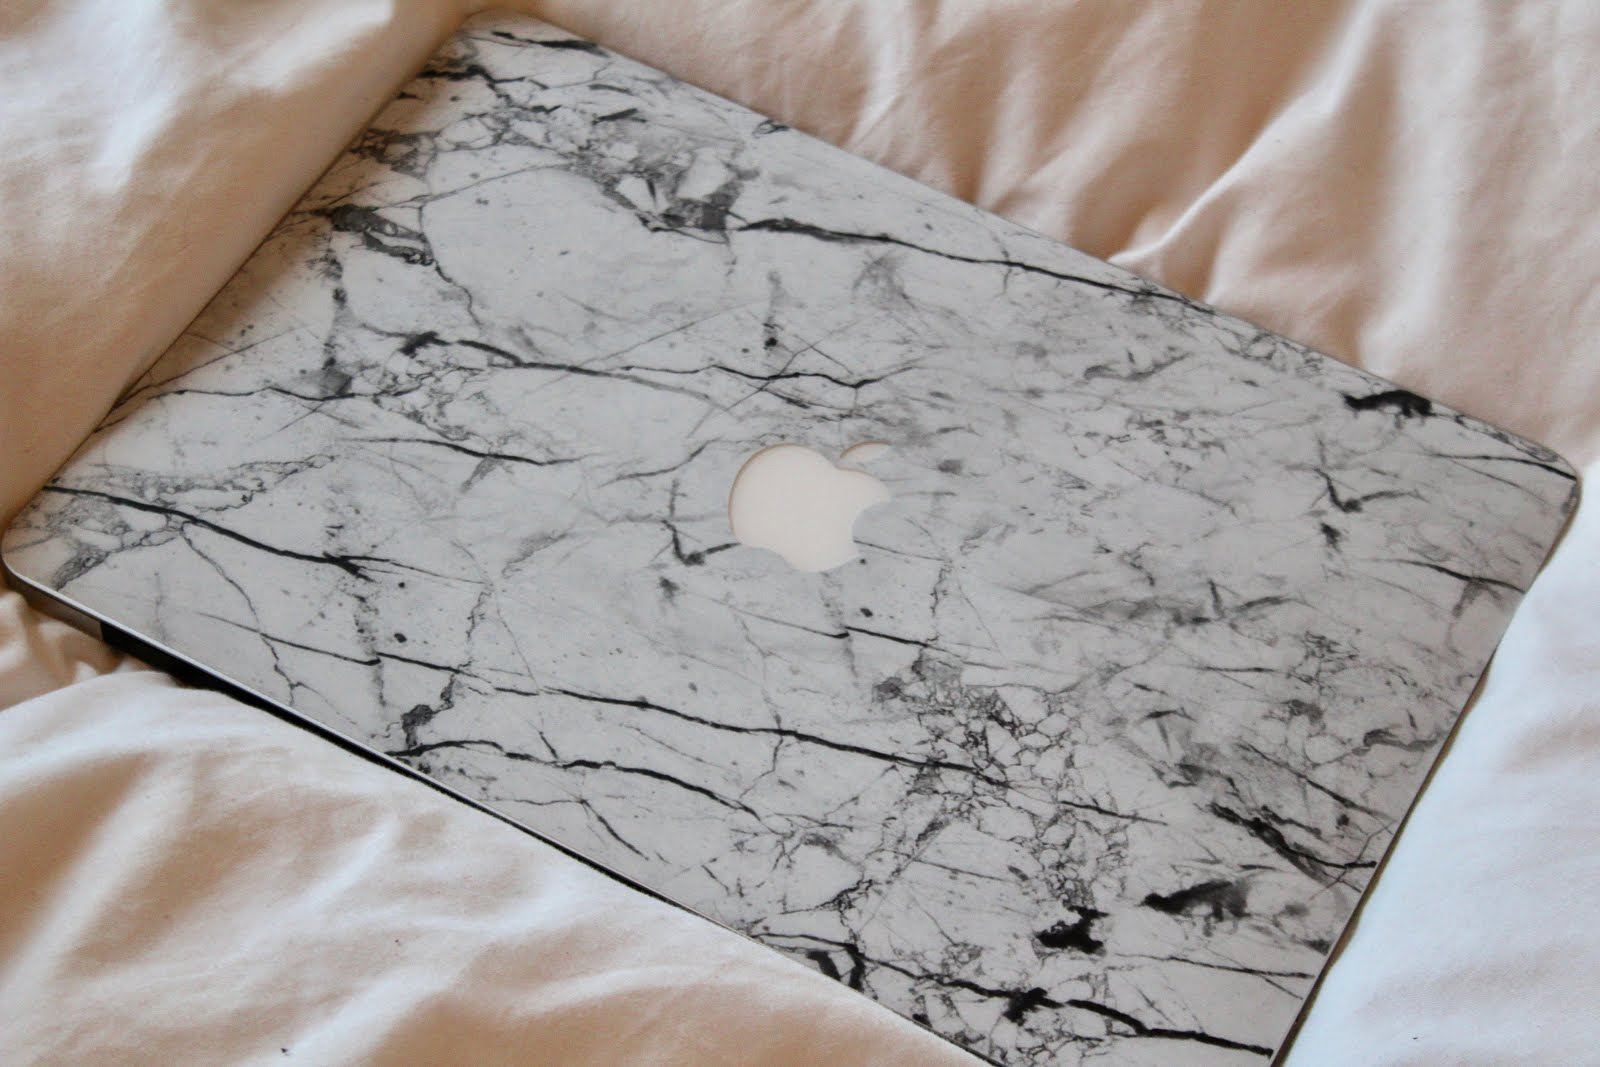 CASEAPP GIVEAWAY | Personalised phone case & laptop skins